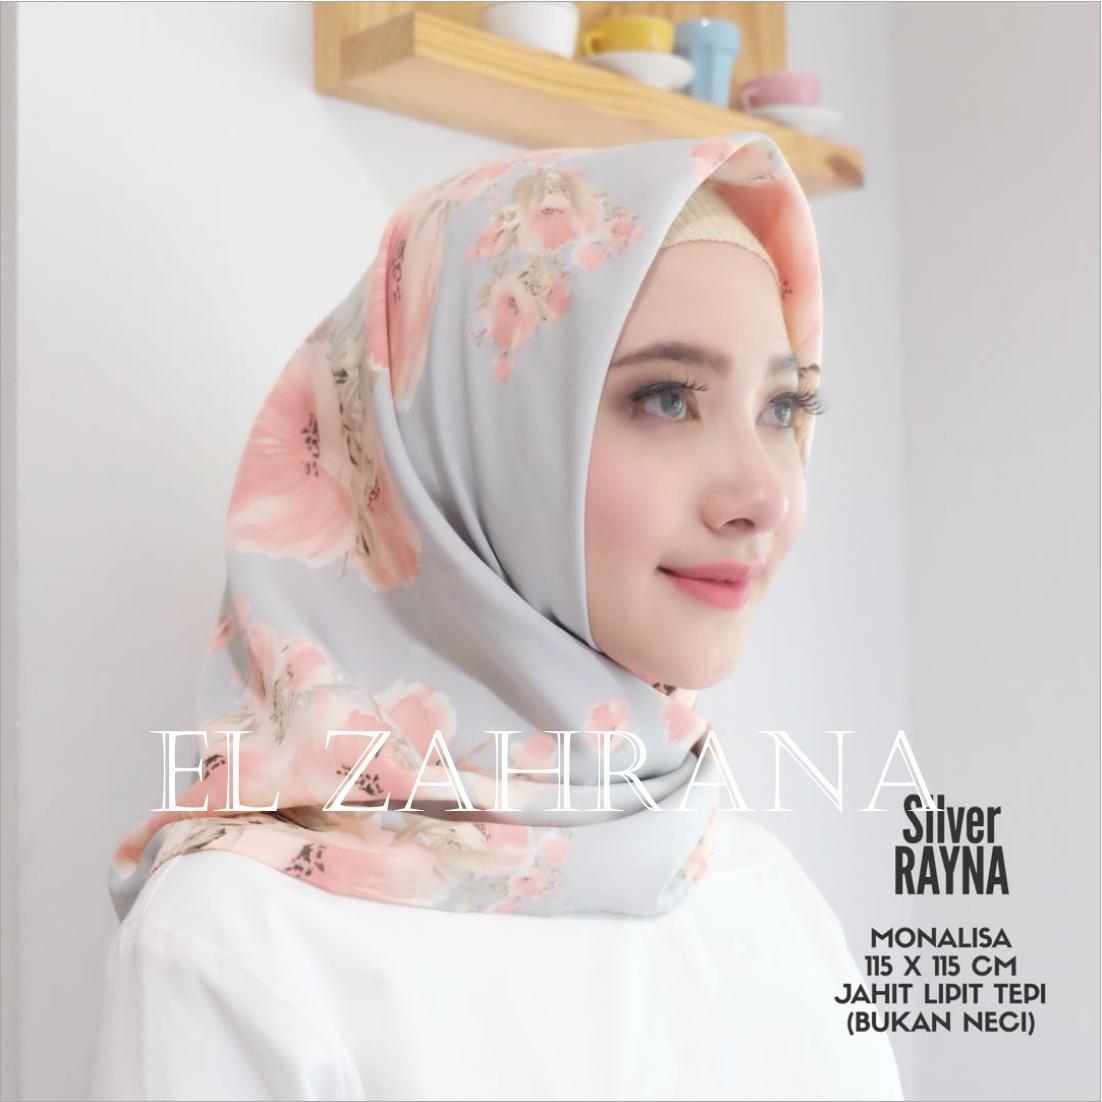 El Zahrana Hijab Square - Kerudung Segi Empat - Jilbab Motif Premium Monalisa